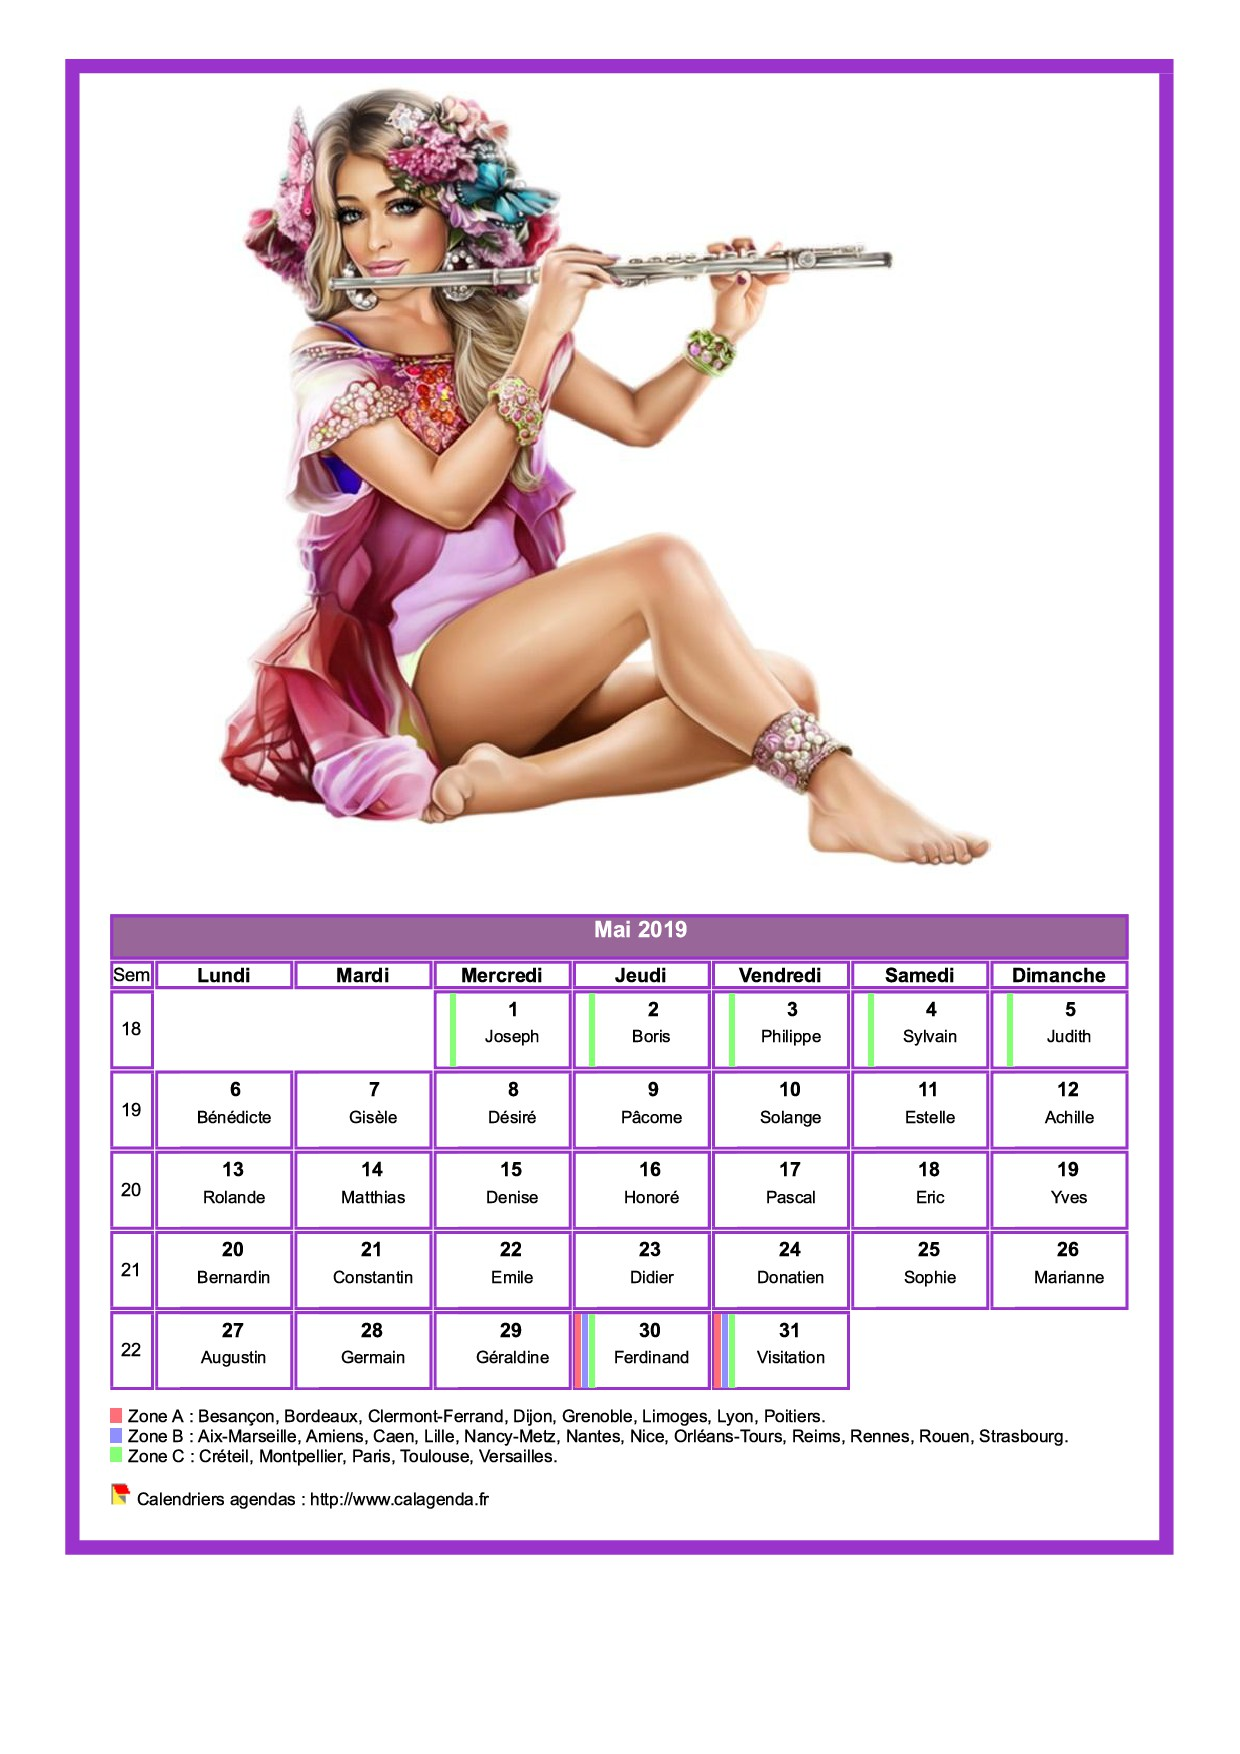 Calendrier mai 2019 femmes